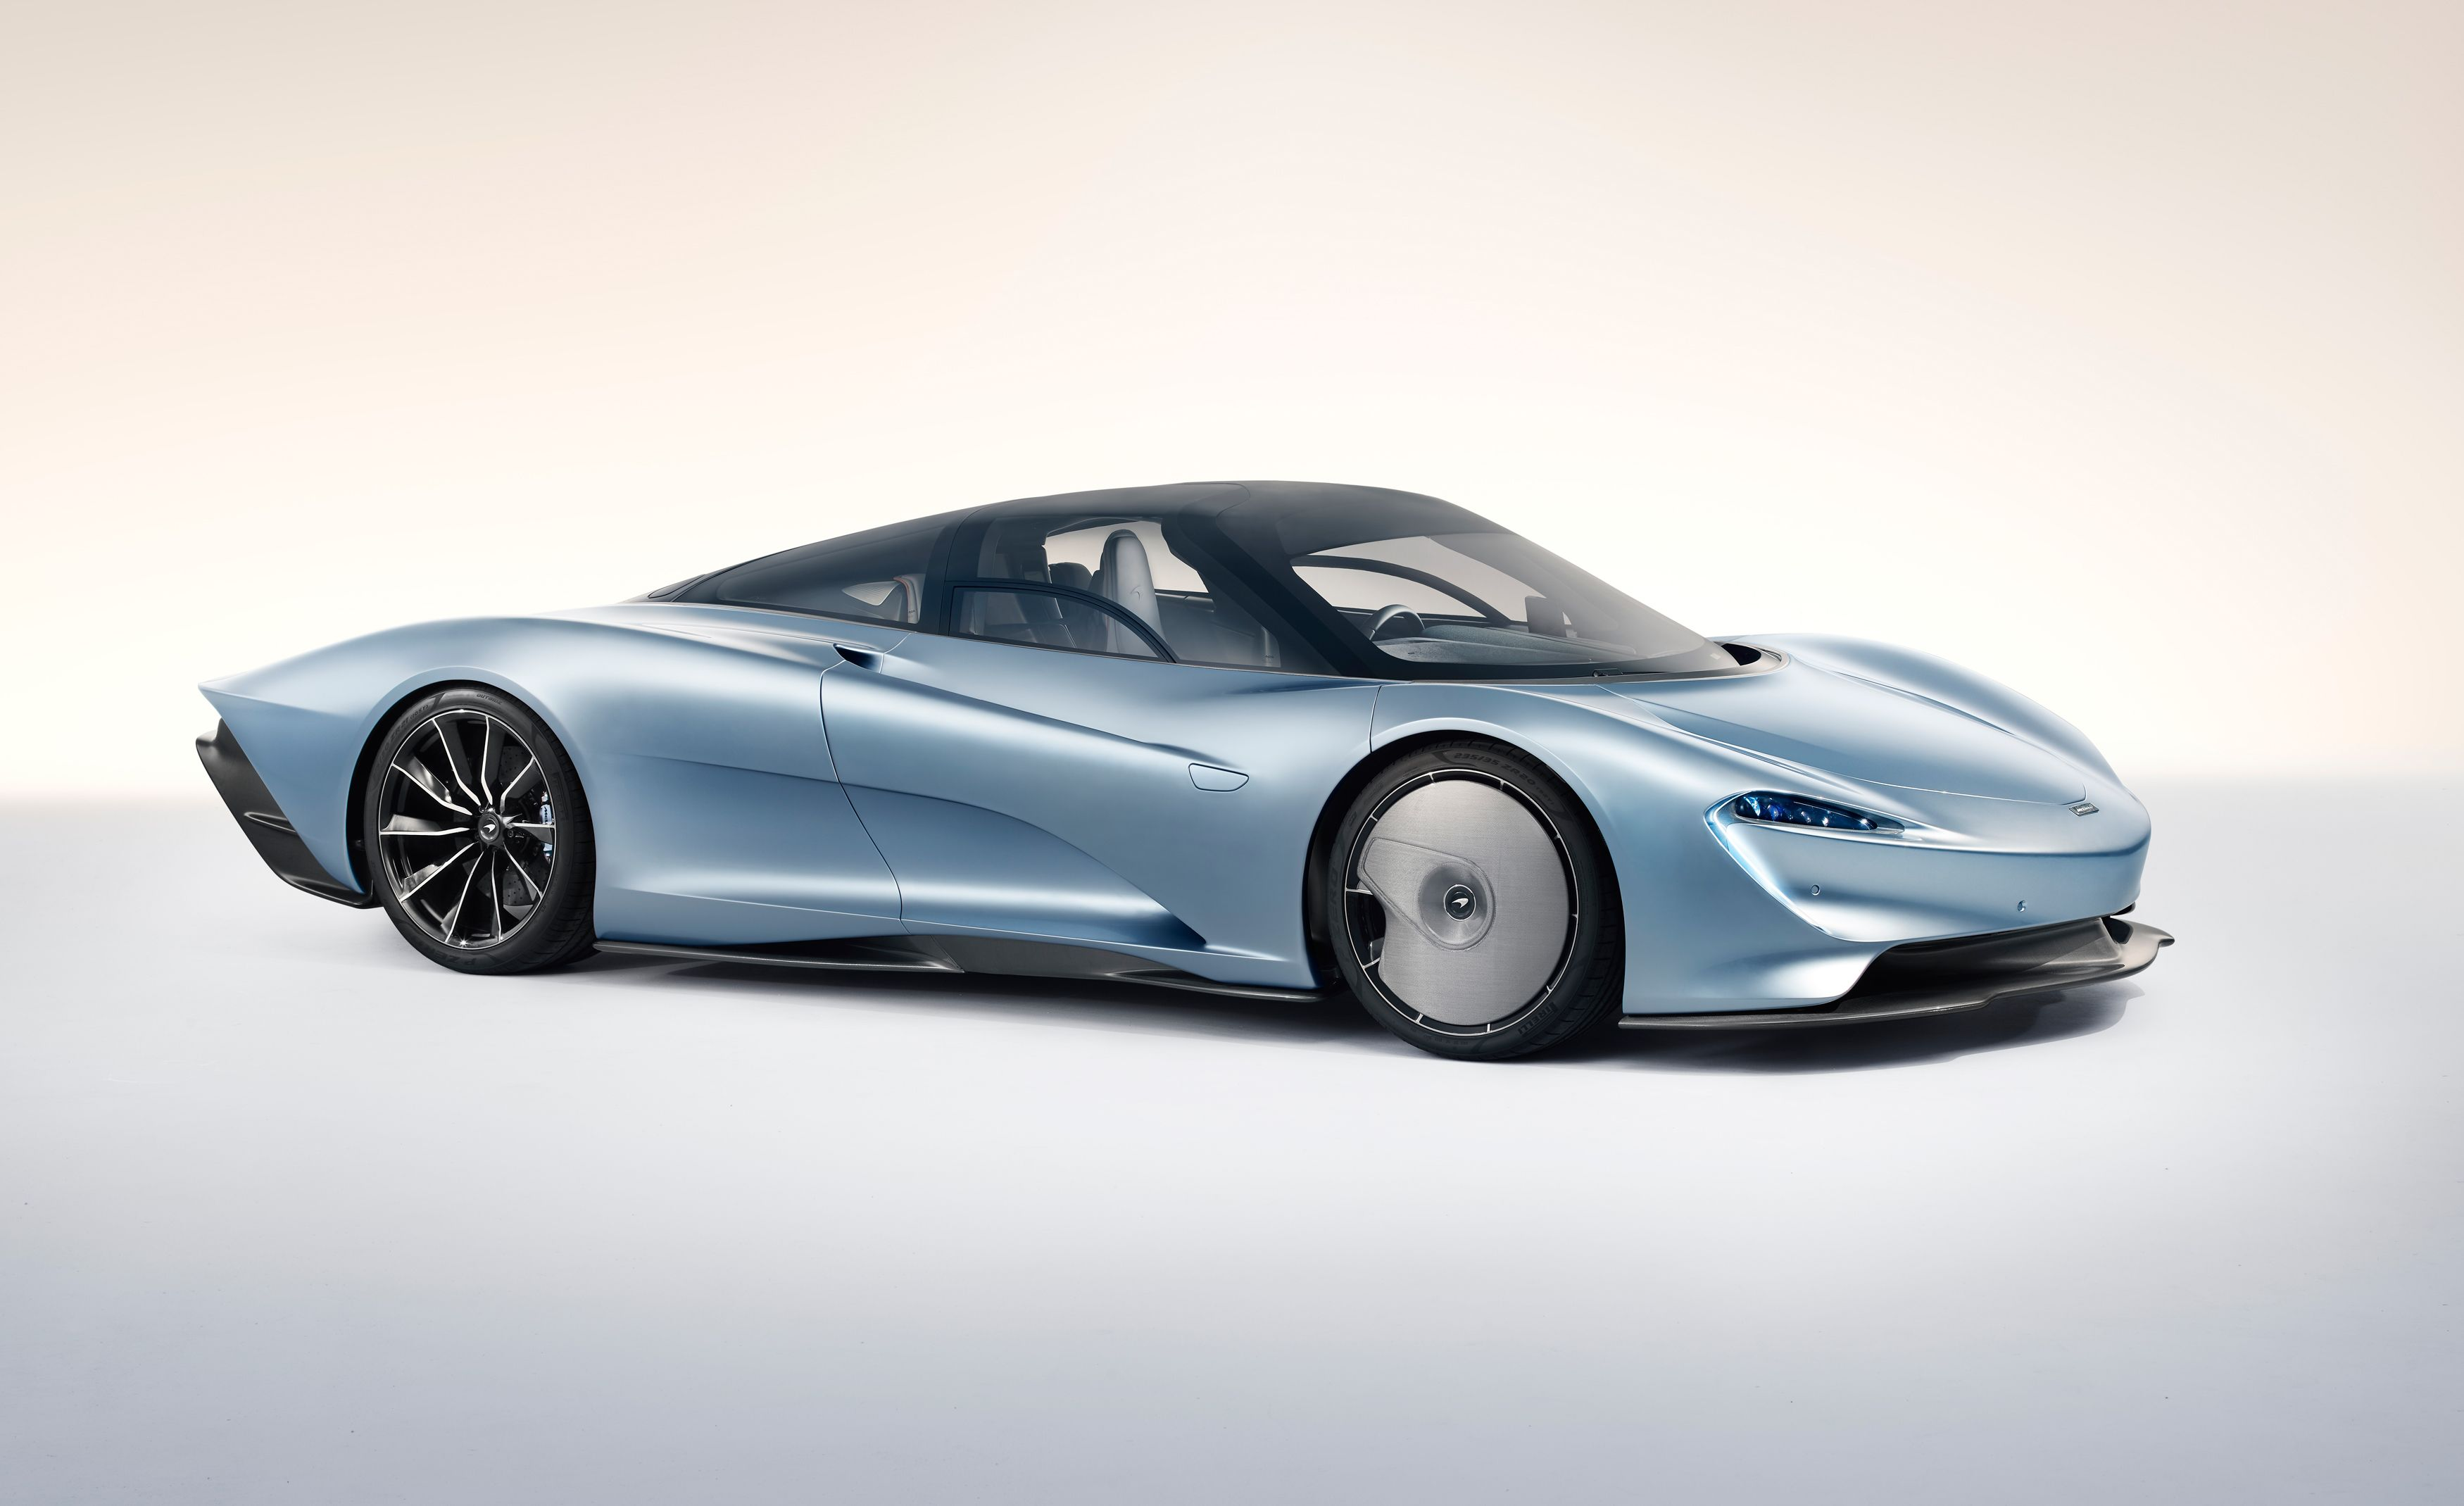 The 2020 McLaren Speedtail Revealed